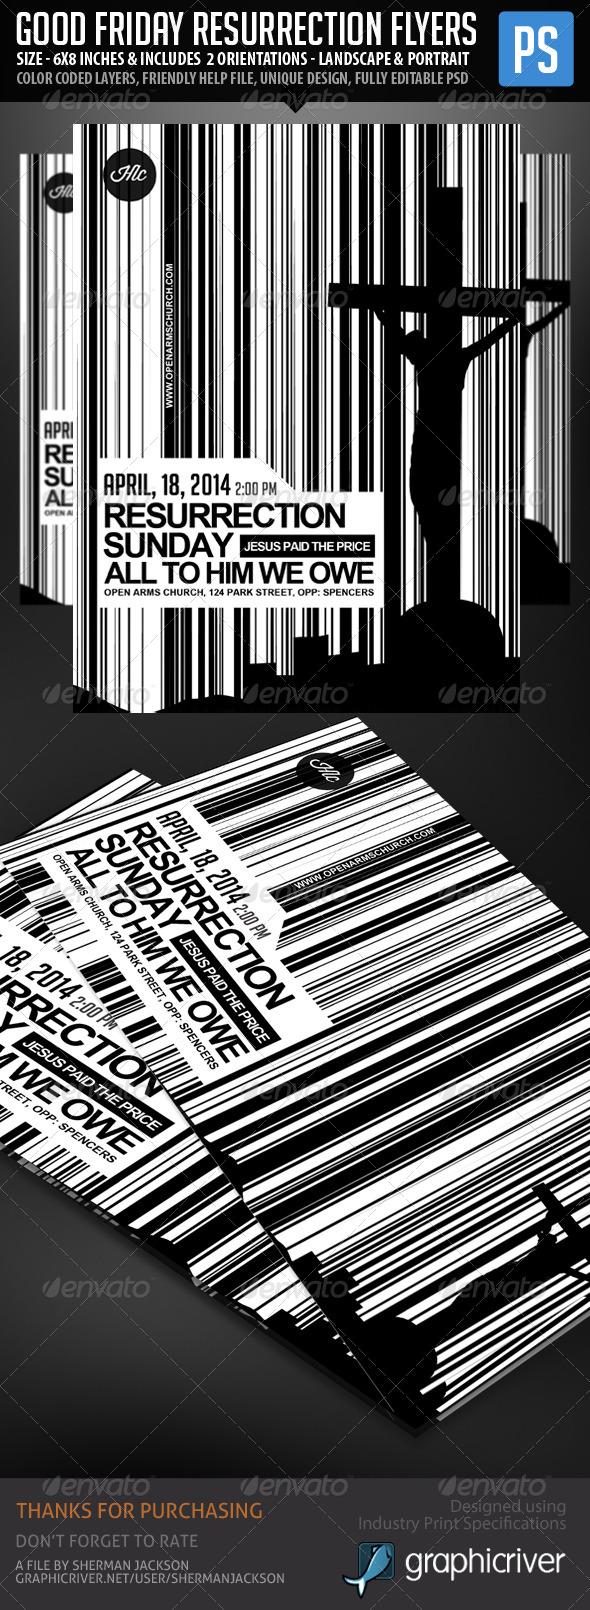 Church/Christian Themed Poster/Flyer Vol.1 - Church Flyers